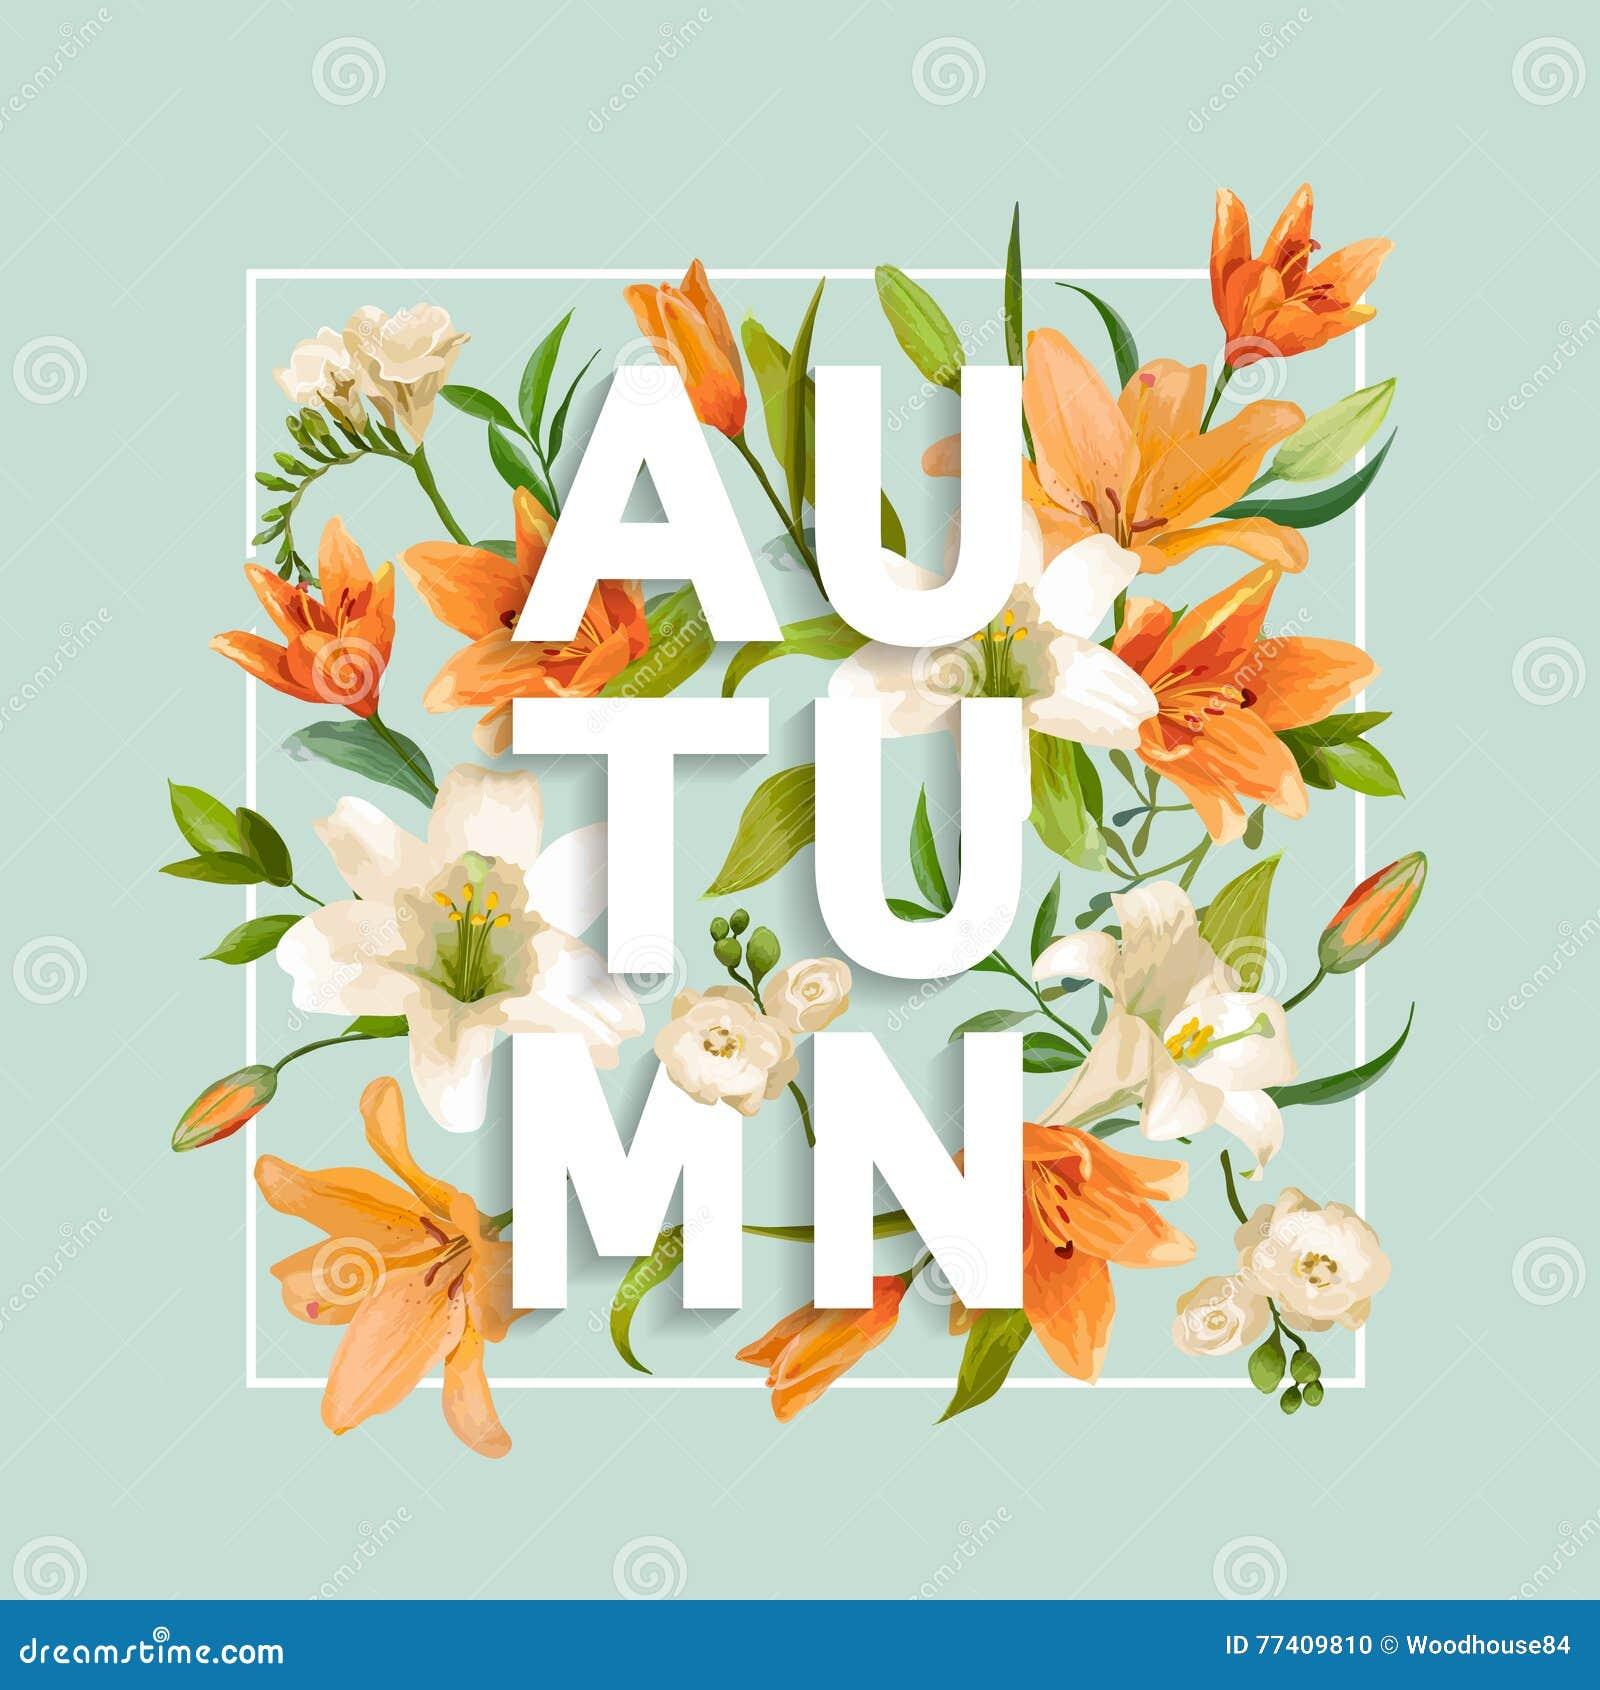 Autumn Lily Flowers Background Autumn Floral Design